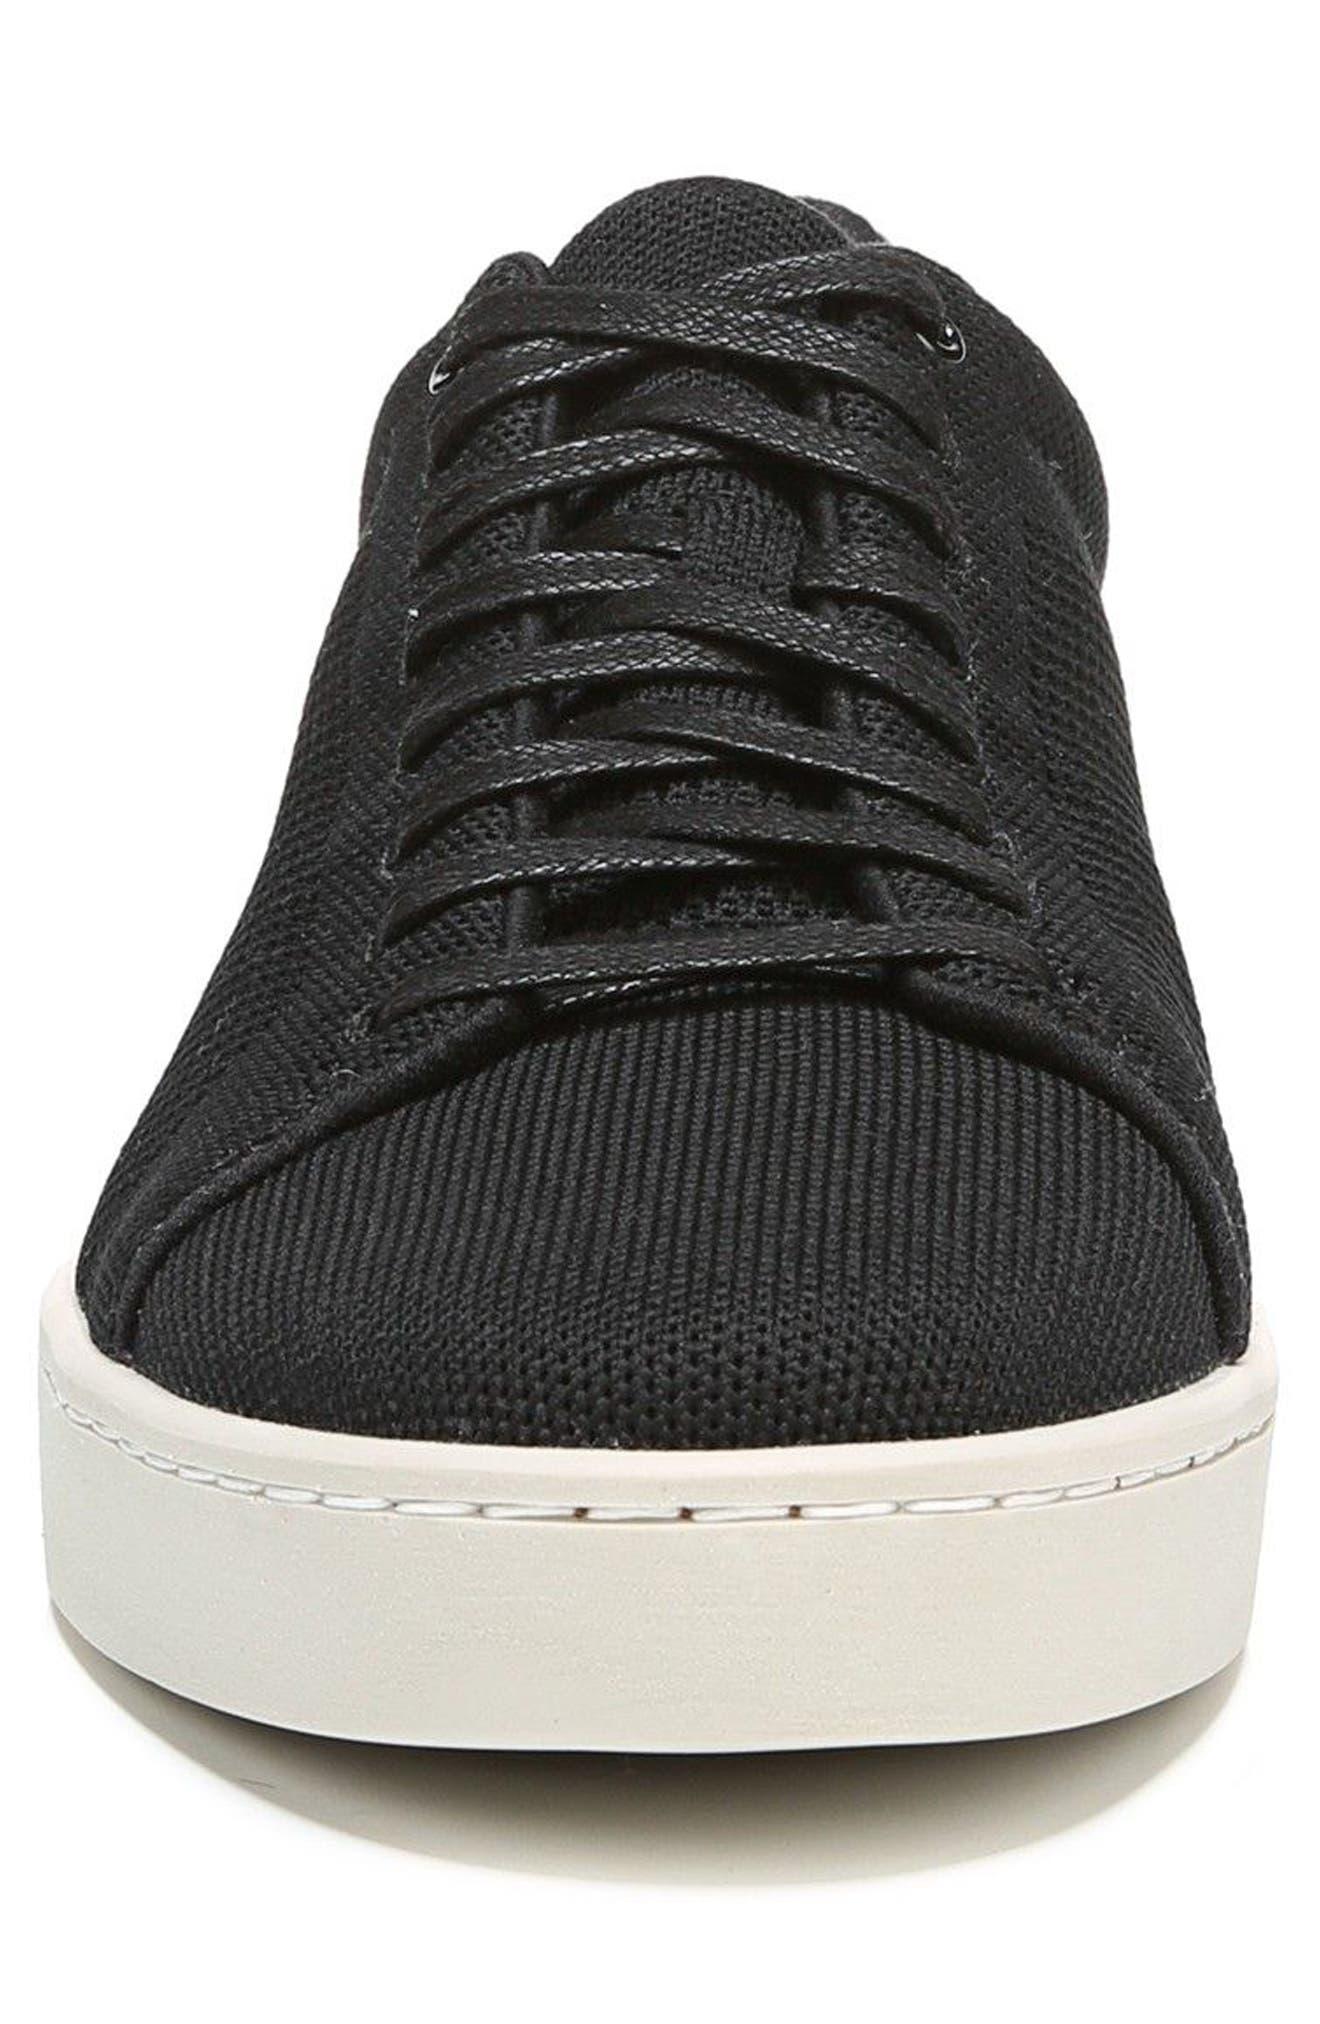 Silos Knit Low Top Sneaker,                             Alternate thumbnail 4, color,                             BLACK/ GRAPHITE